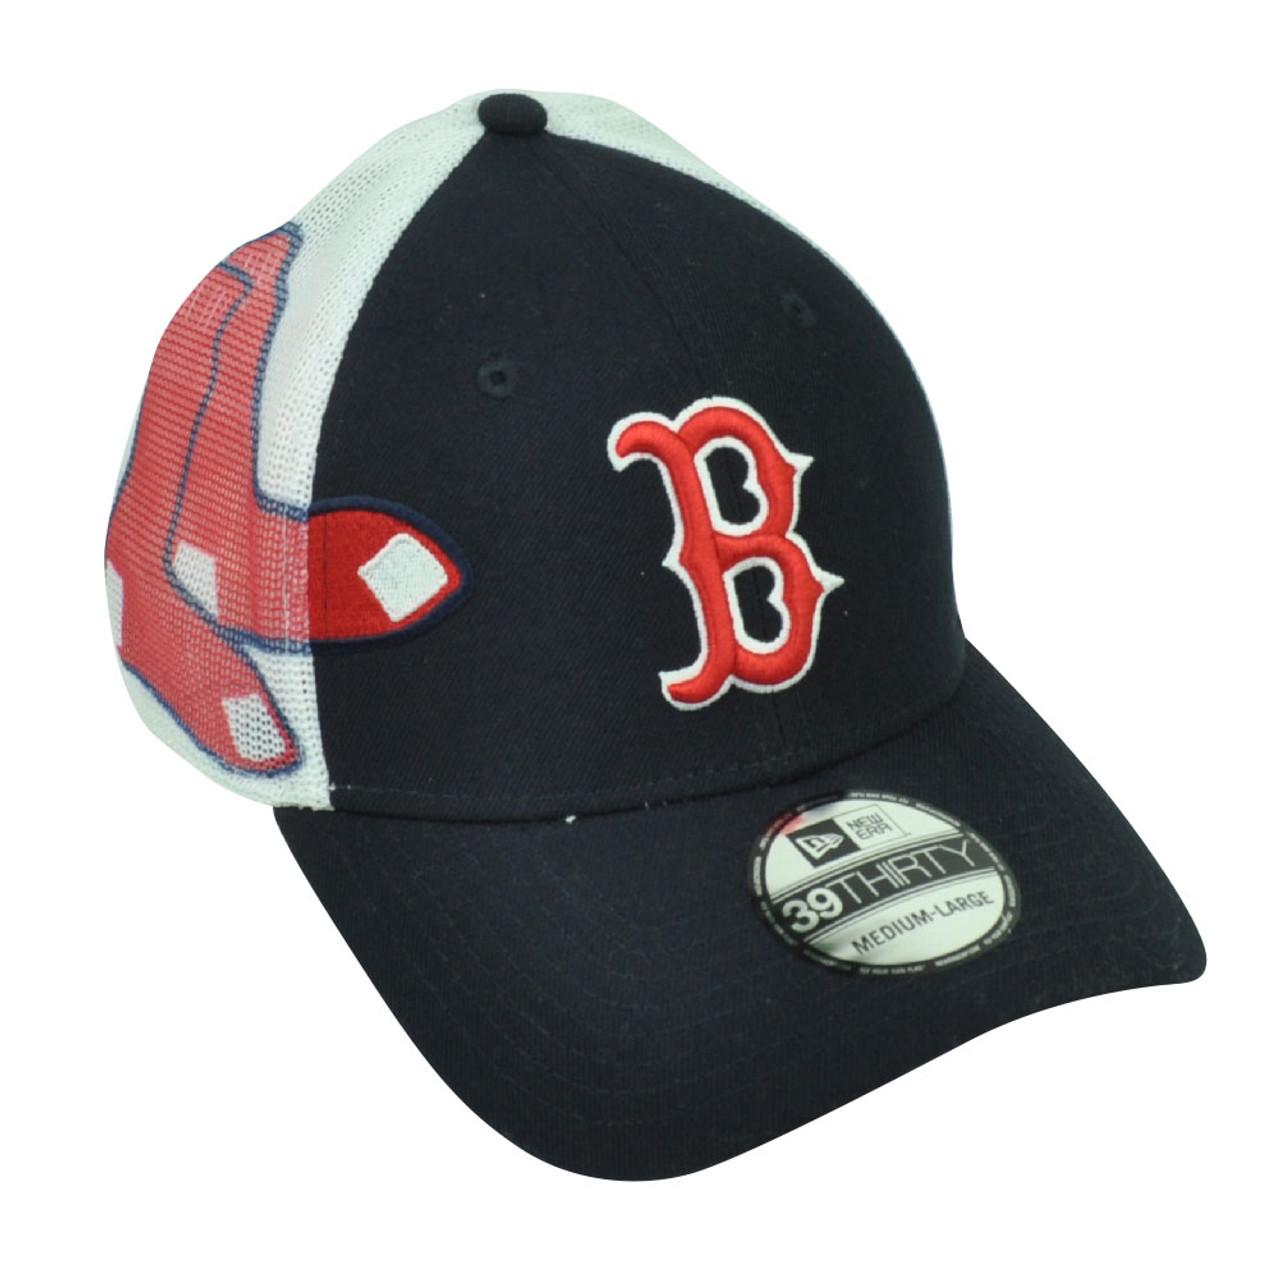 low priced ddc90 65b39 MLB New Era 39Thirty Boston Red Sox Double Mesh Flex Fit Small Medium Hat  Cap - Cap Store Online.com